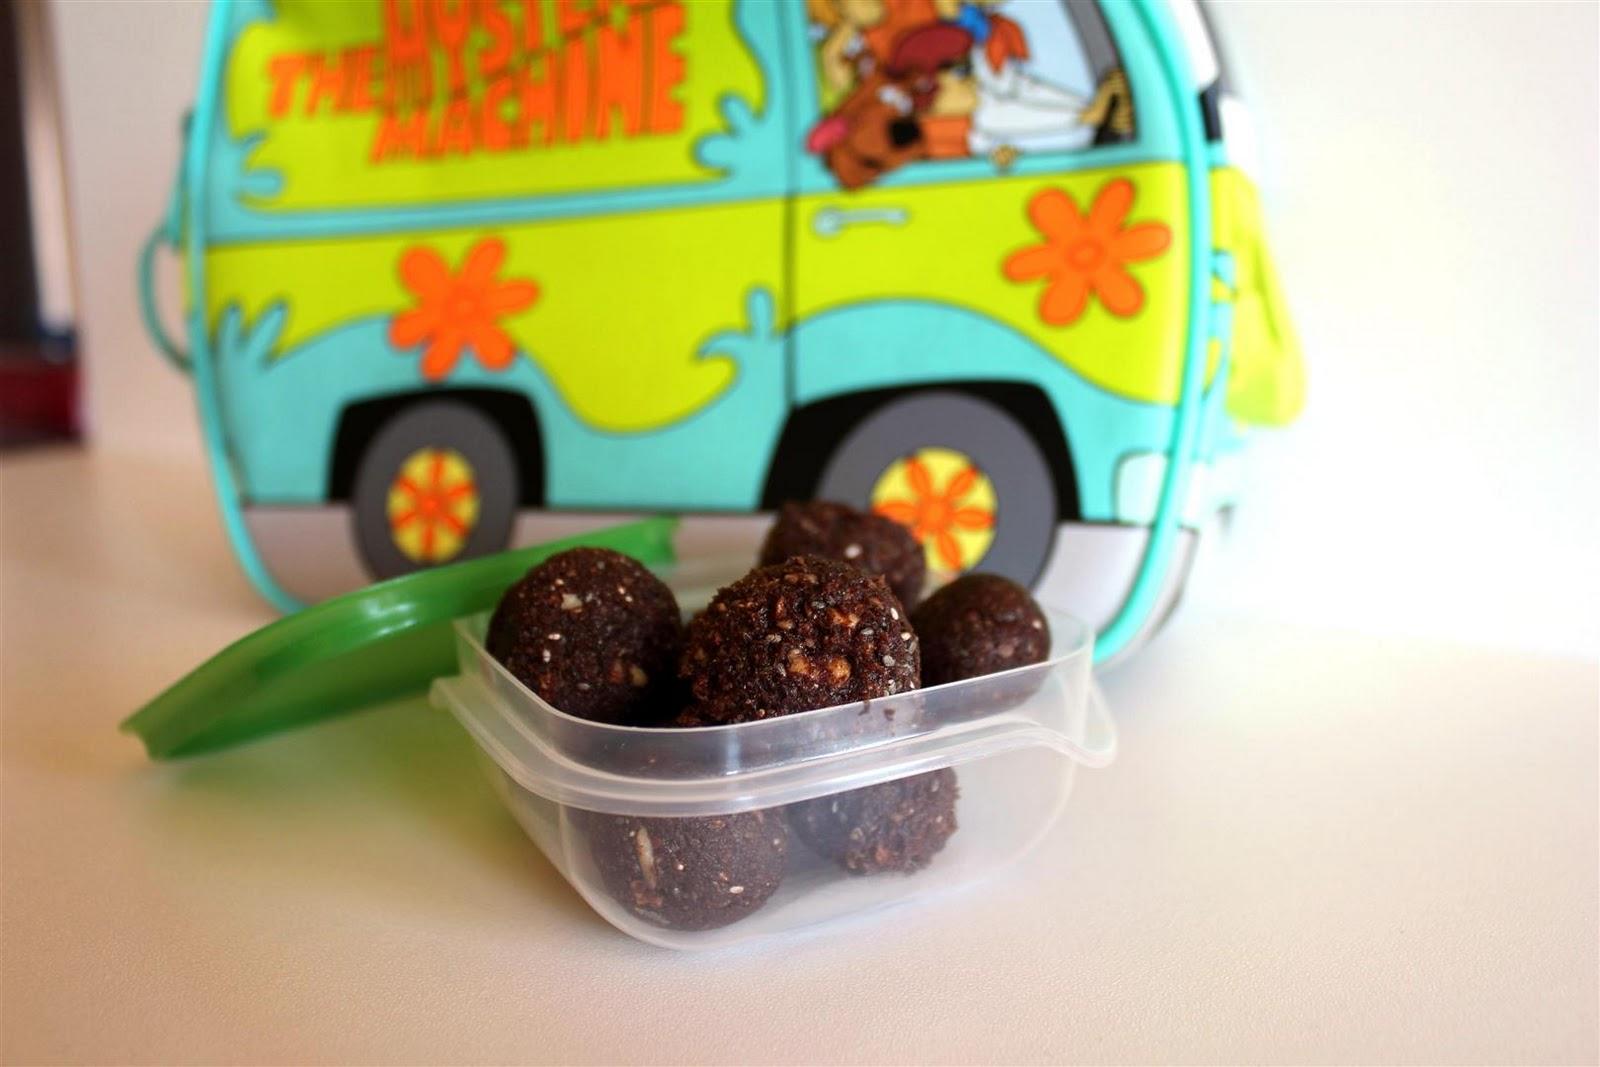 Scooby cookies recipe